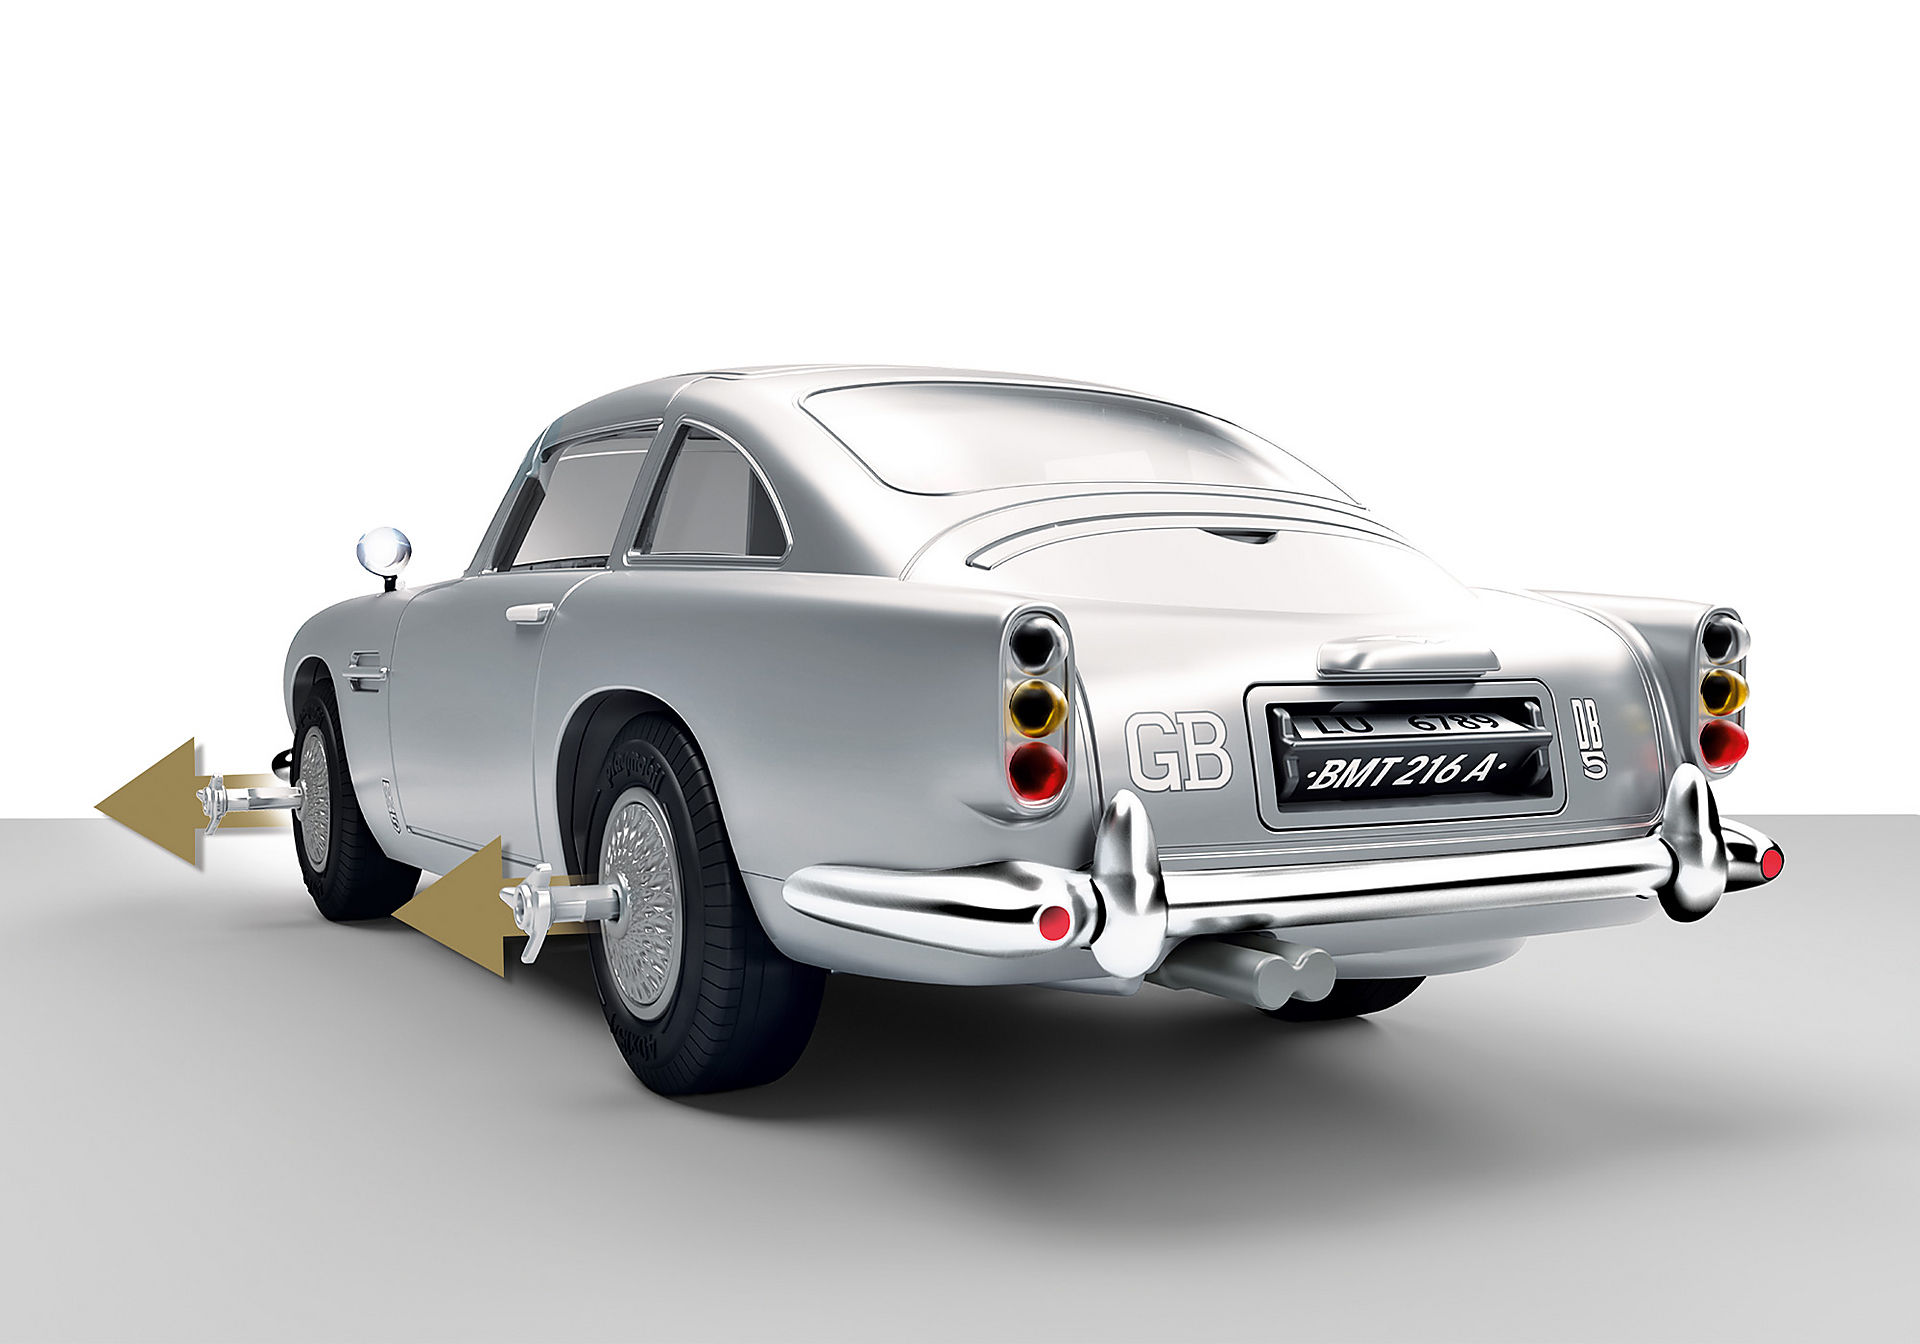 70578 James Bond Aston Martin DB5 - Goldfinger Edition zoom image10